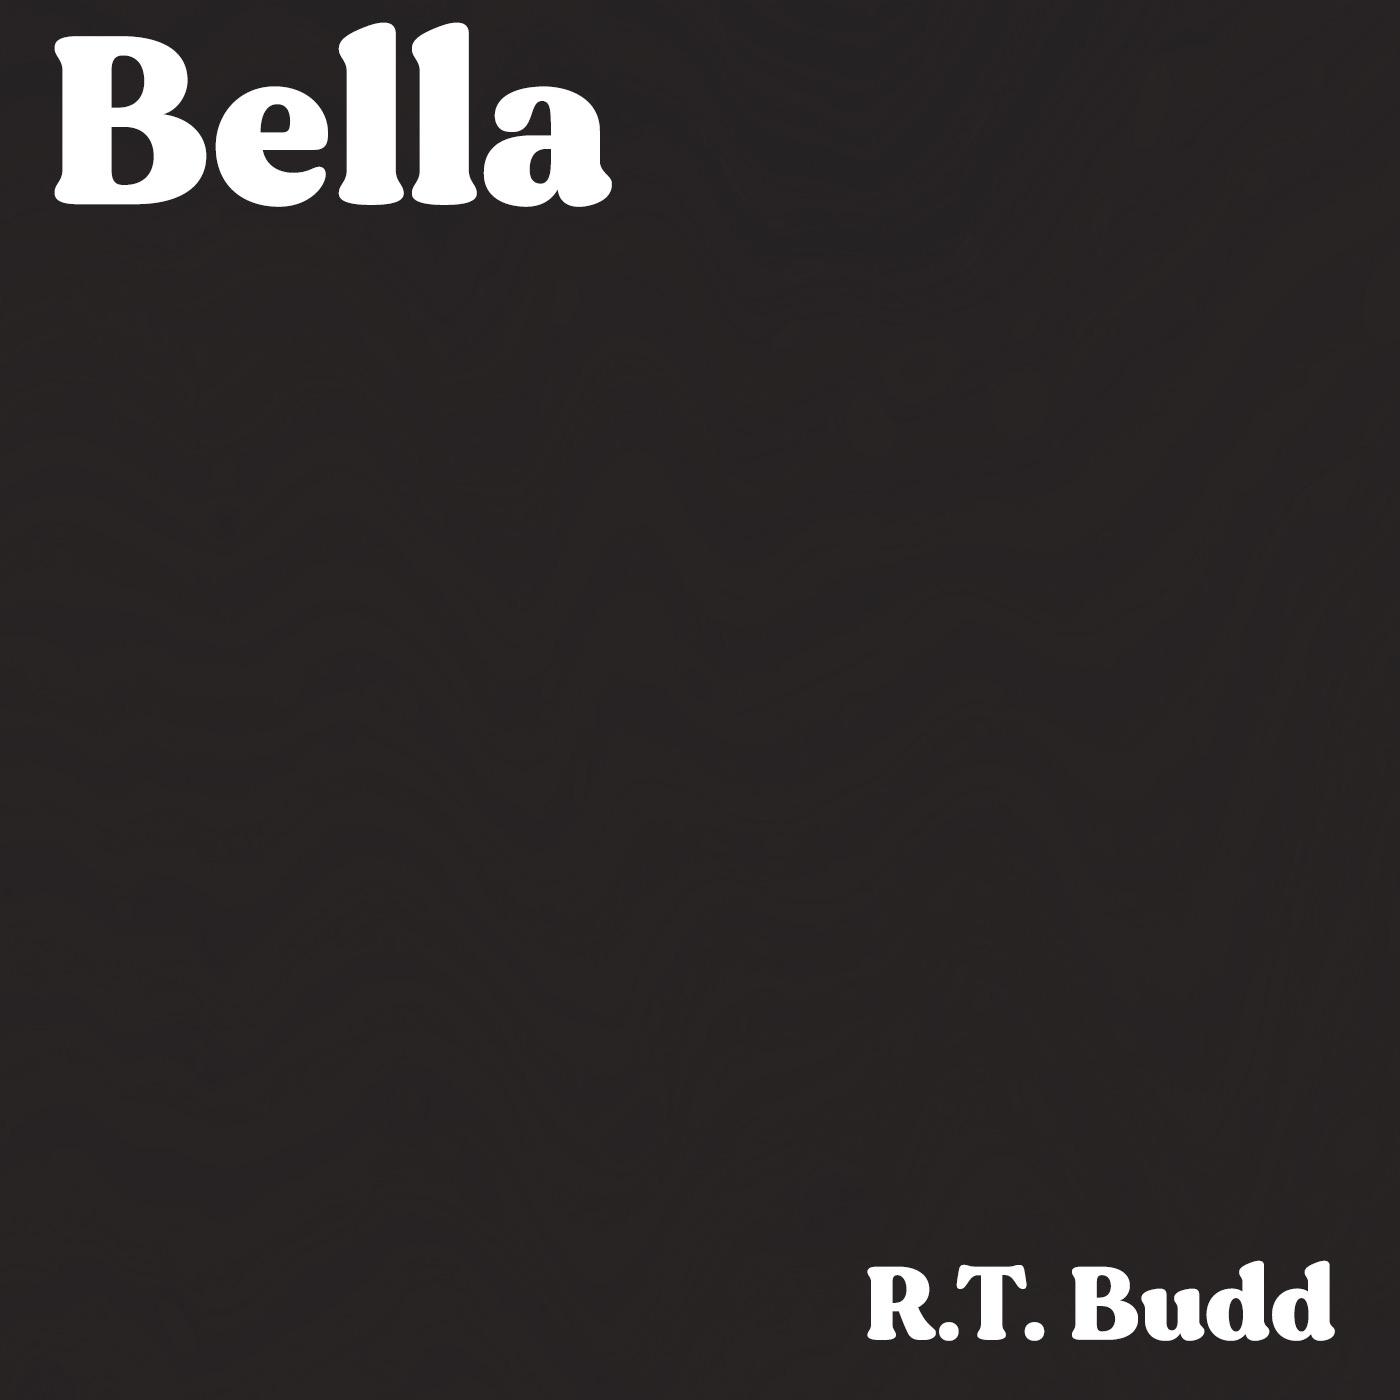 Bella-RT-Budd